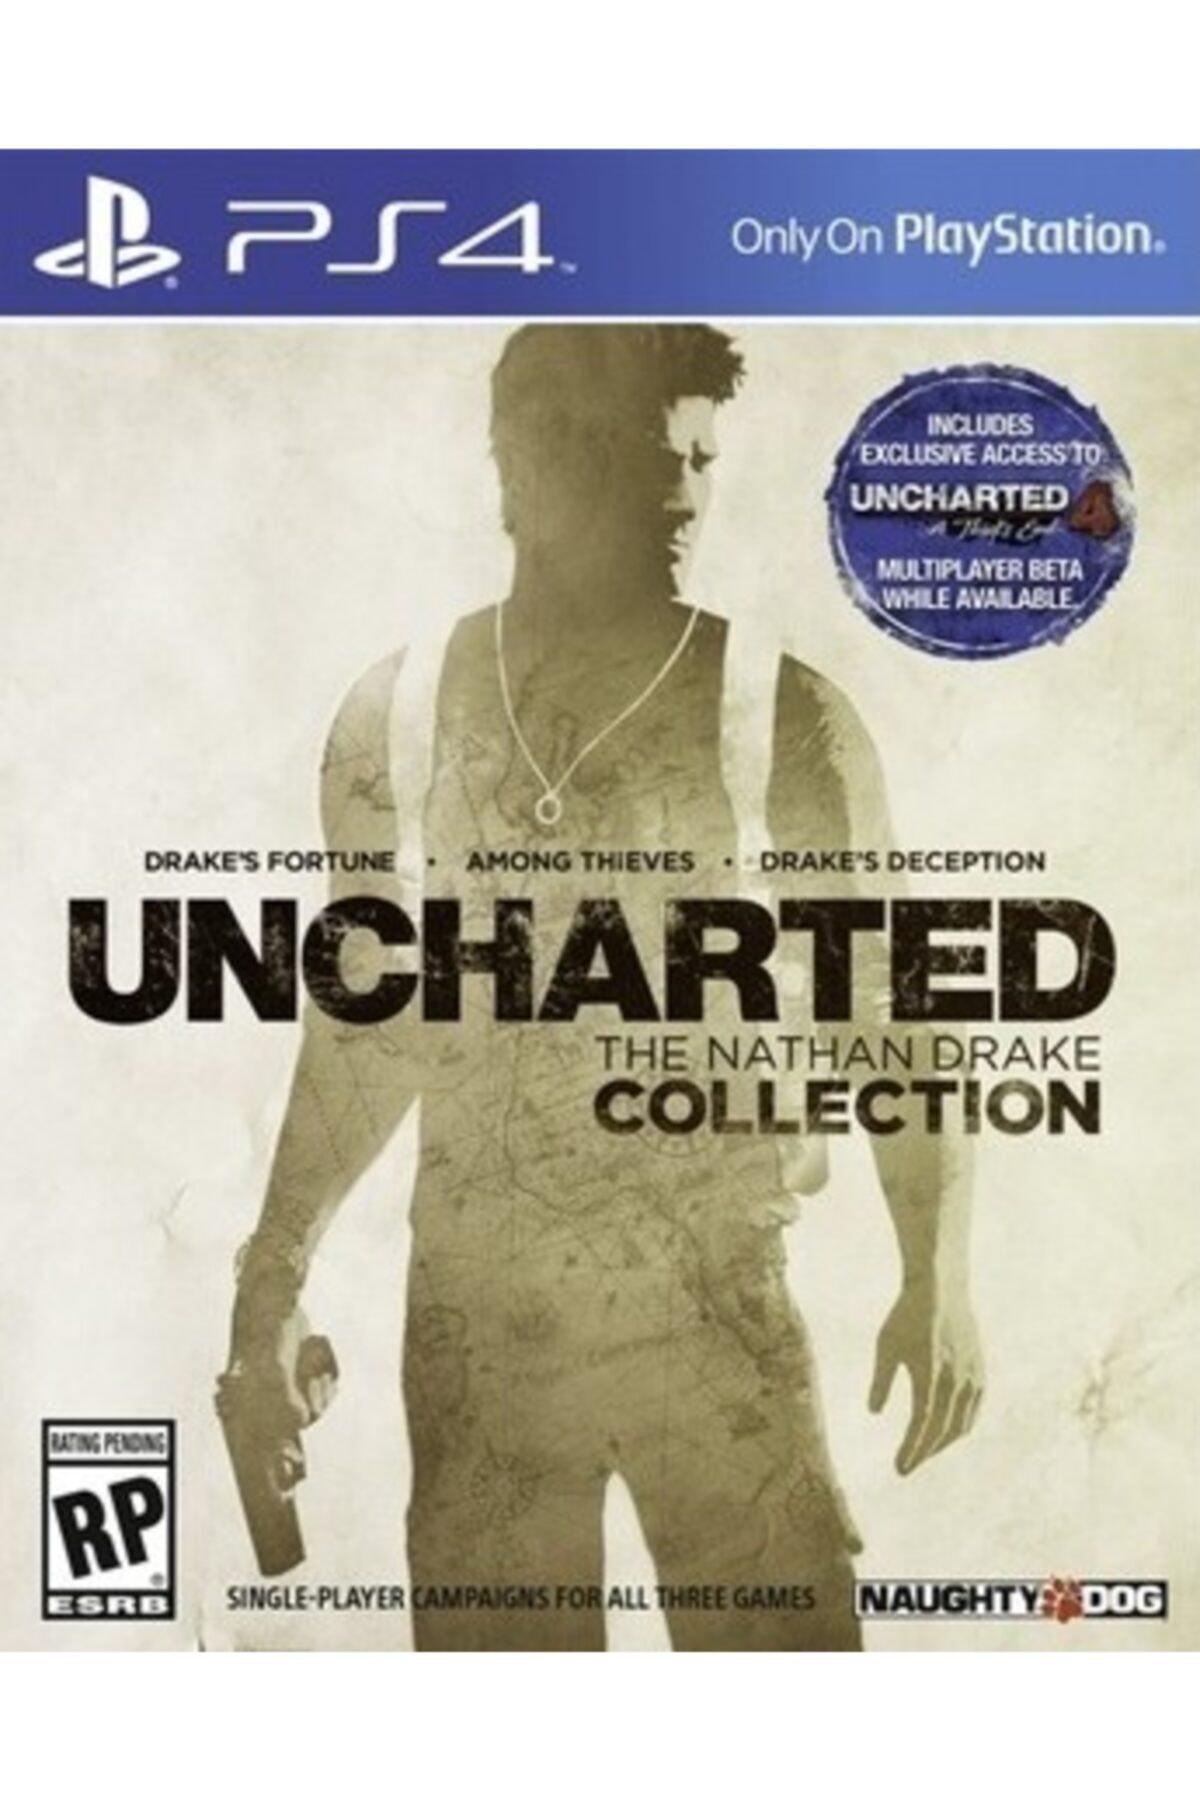 Naughty Dog Ps4 Uncharted Collection- Orjinal Oyun - Sıfır Jelatin 1